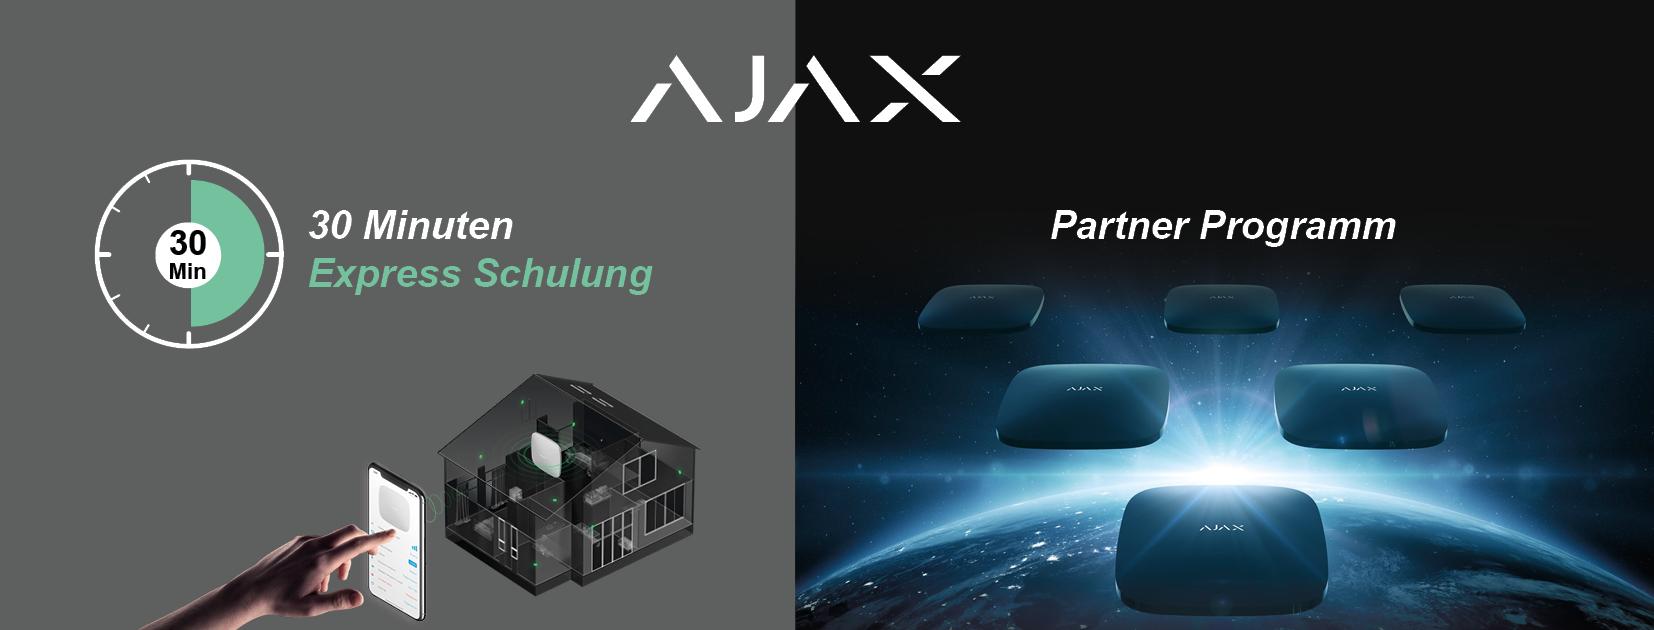 Ajax_alarmanlage